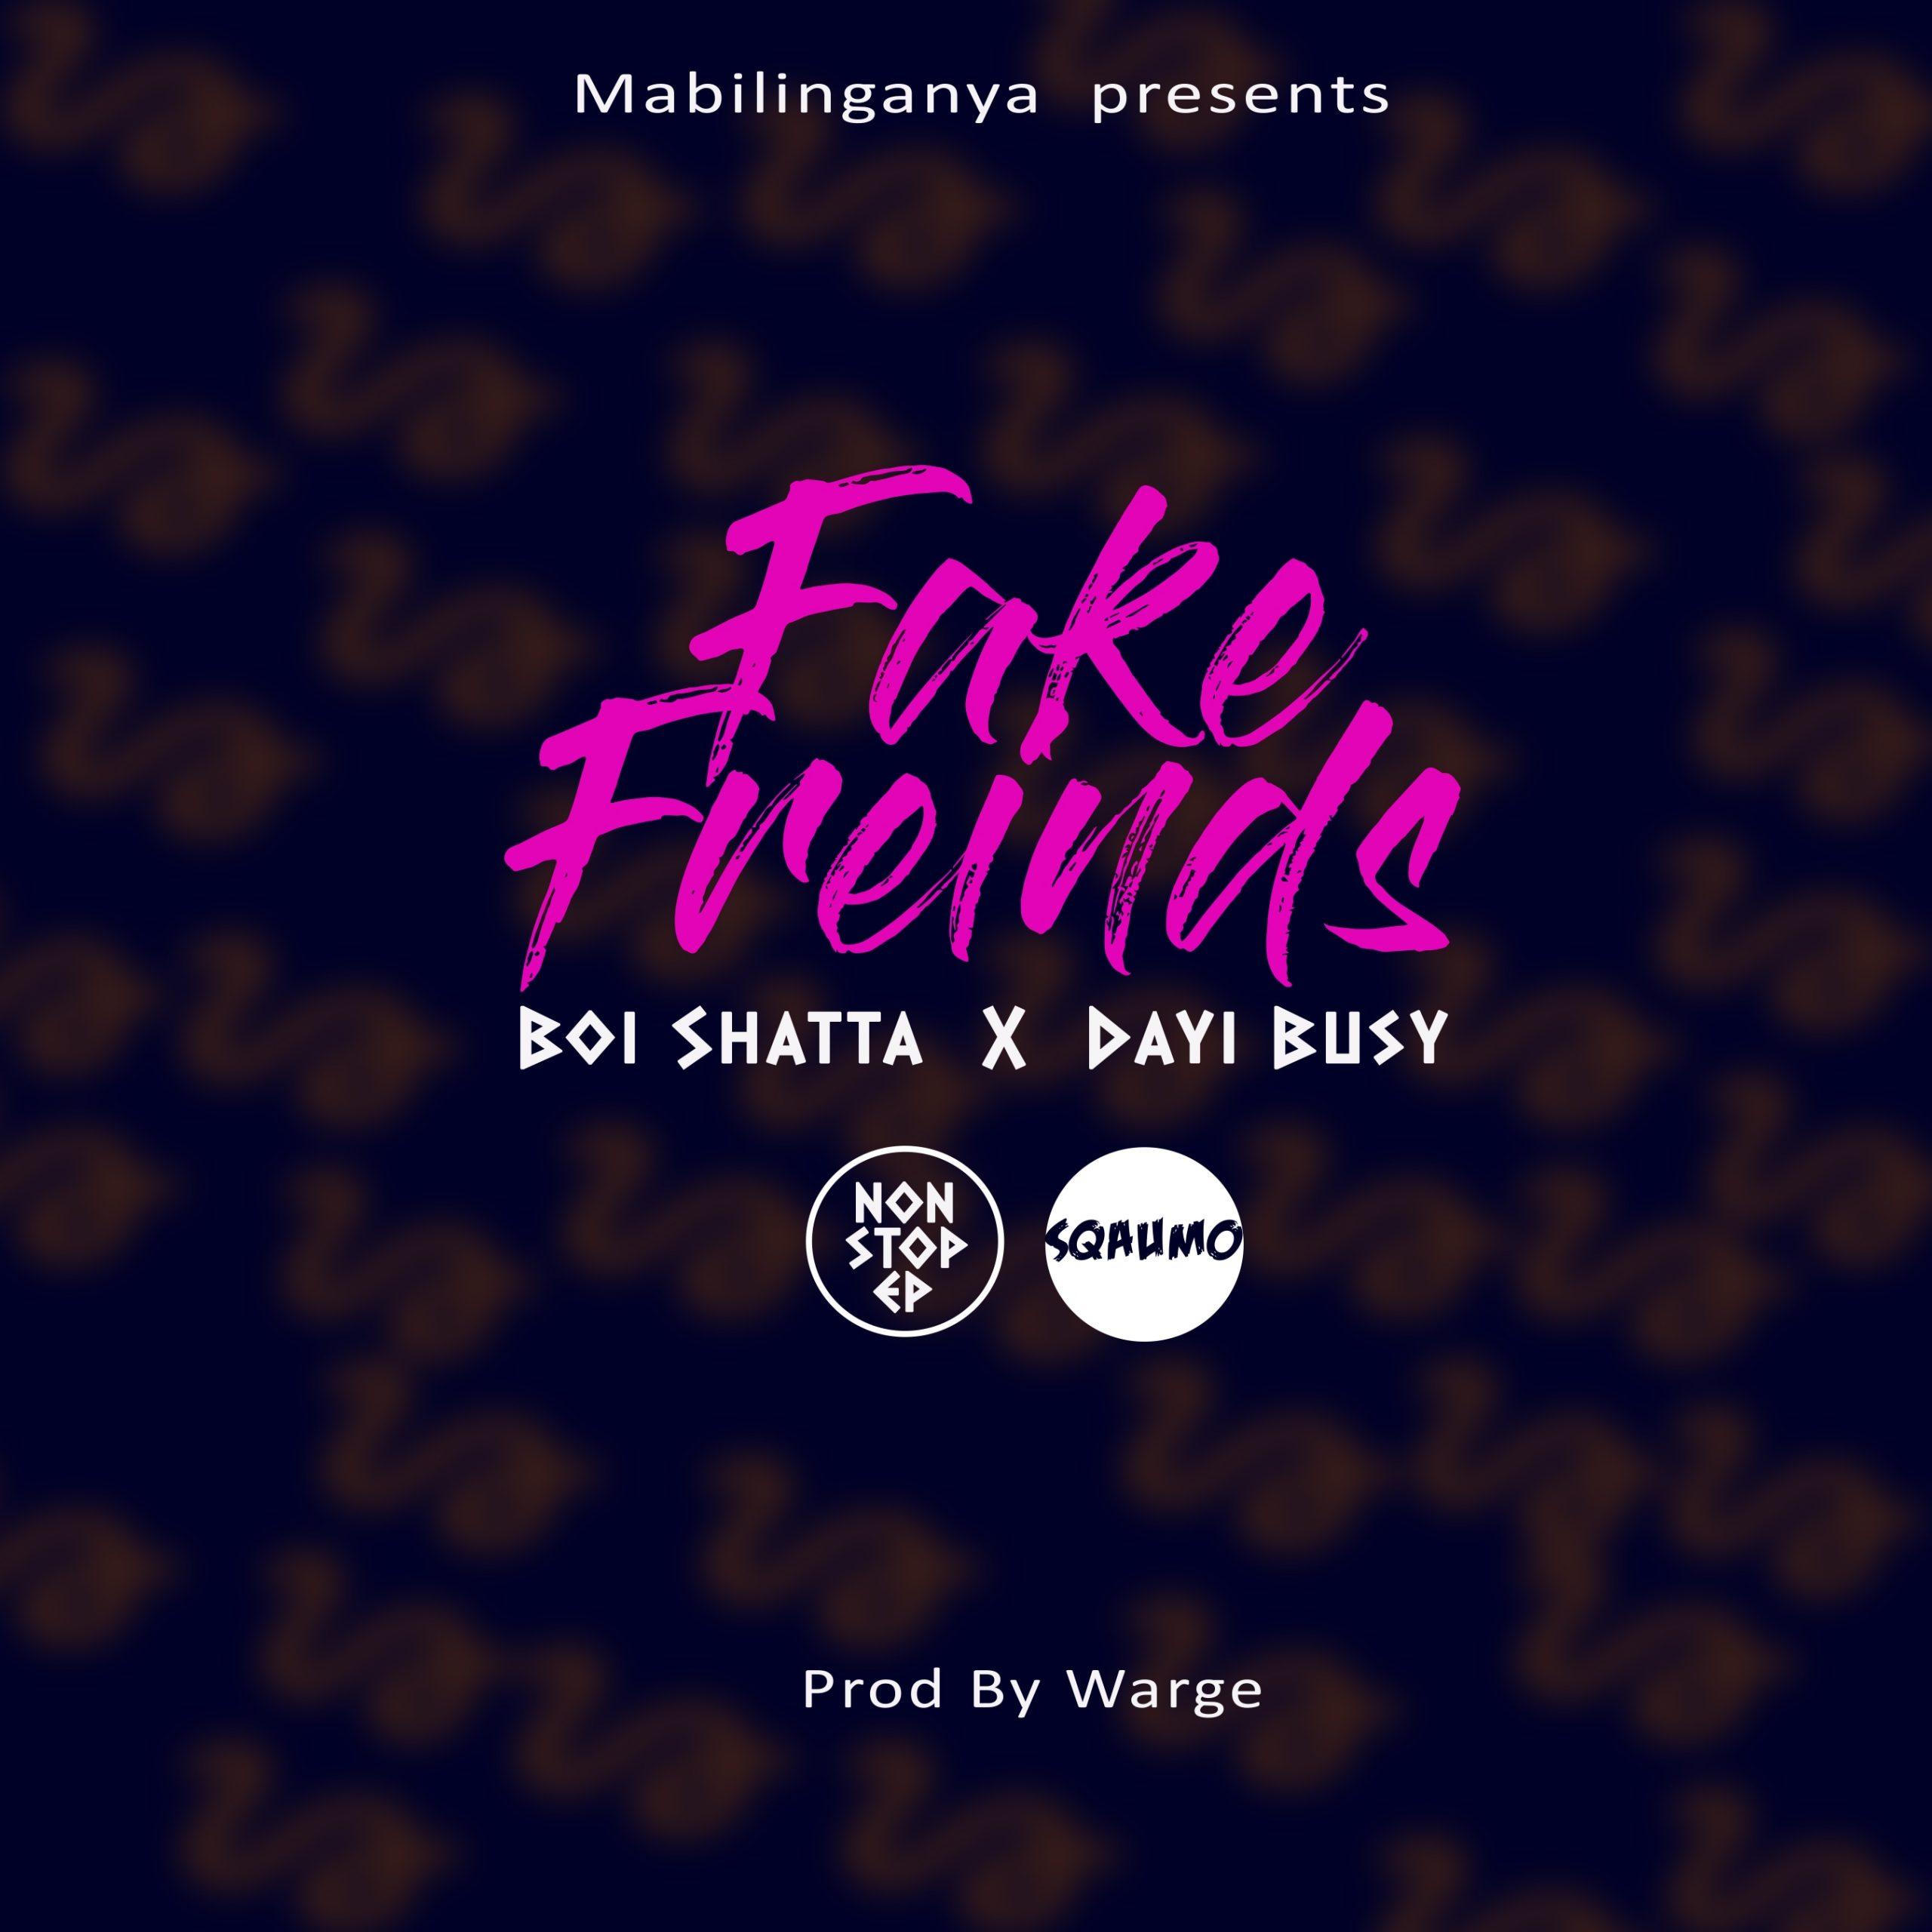 Shatta-Deya-Ft-Dayi-Busy-Fake-Friends-Prod-by-Warge-Records